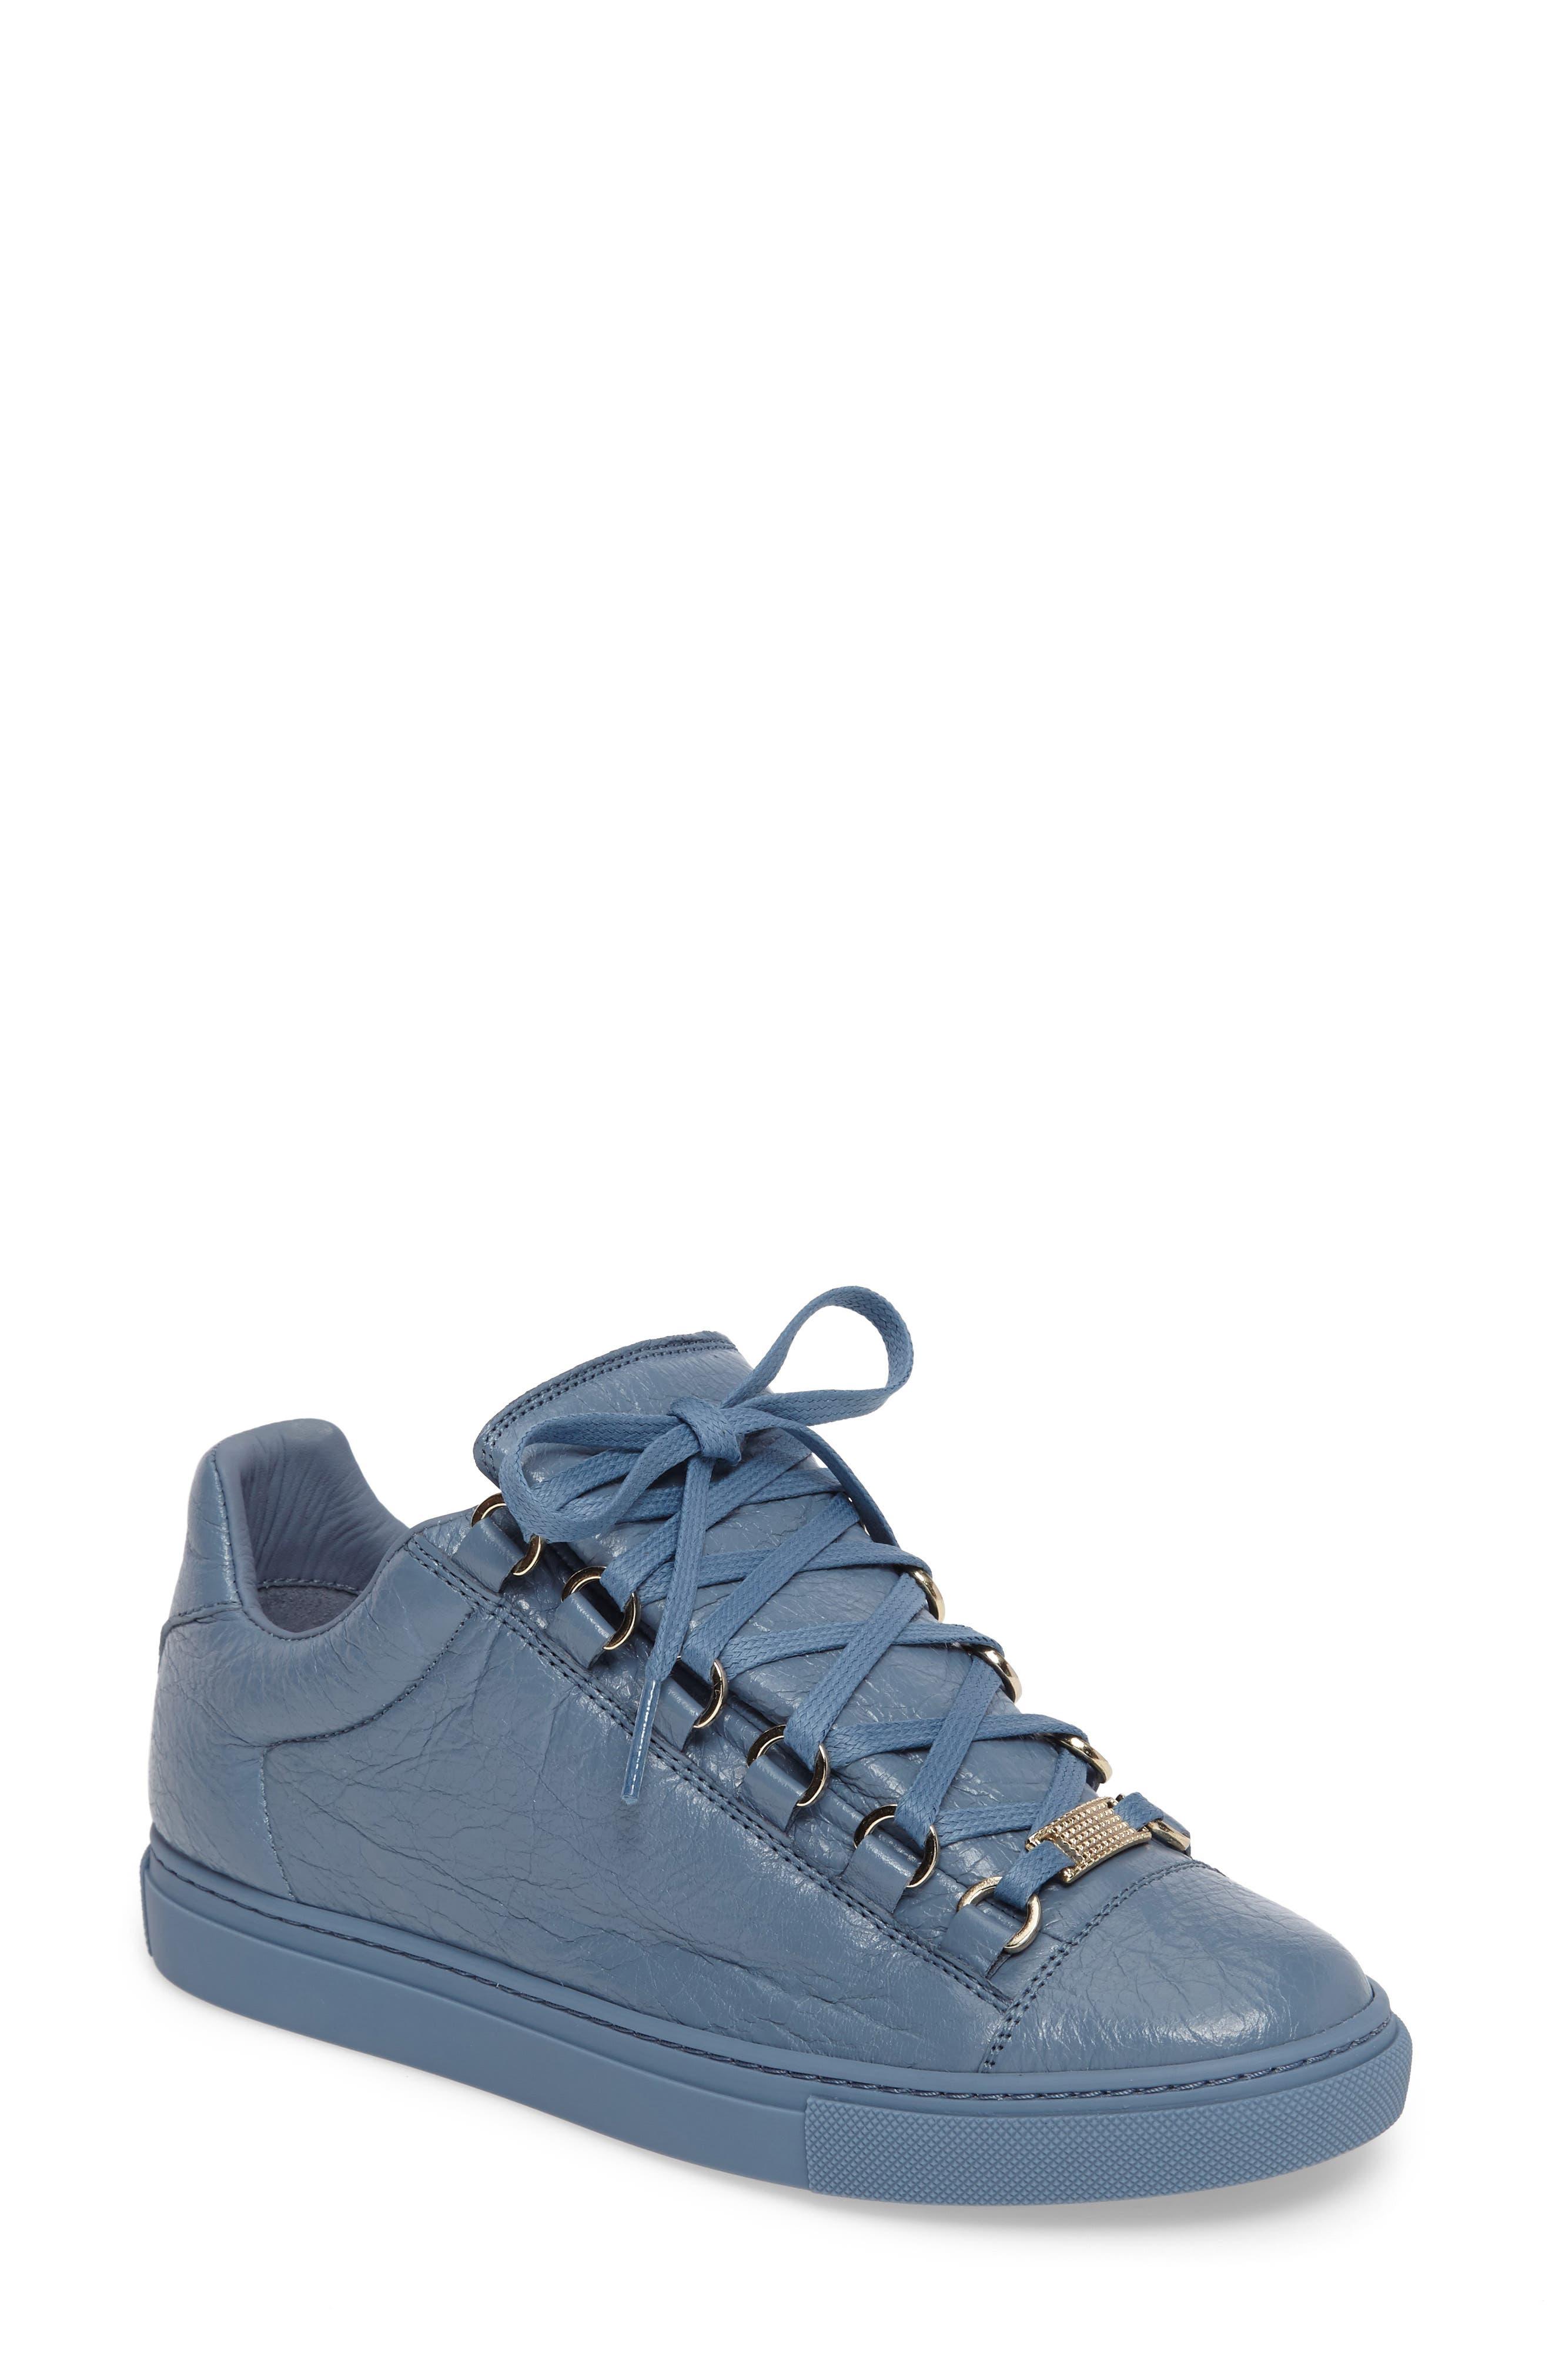 Balenciaga Low Top Sneaker (Women